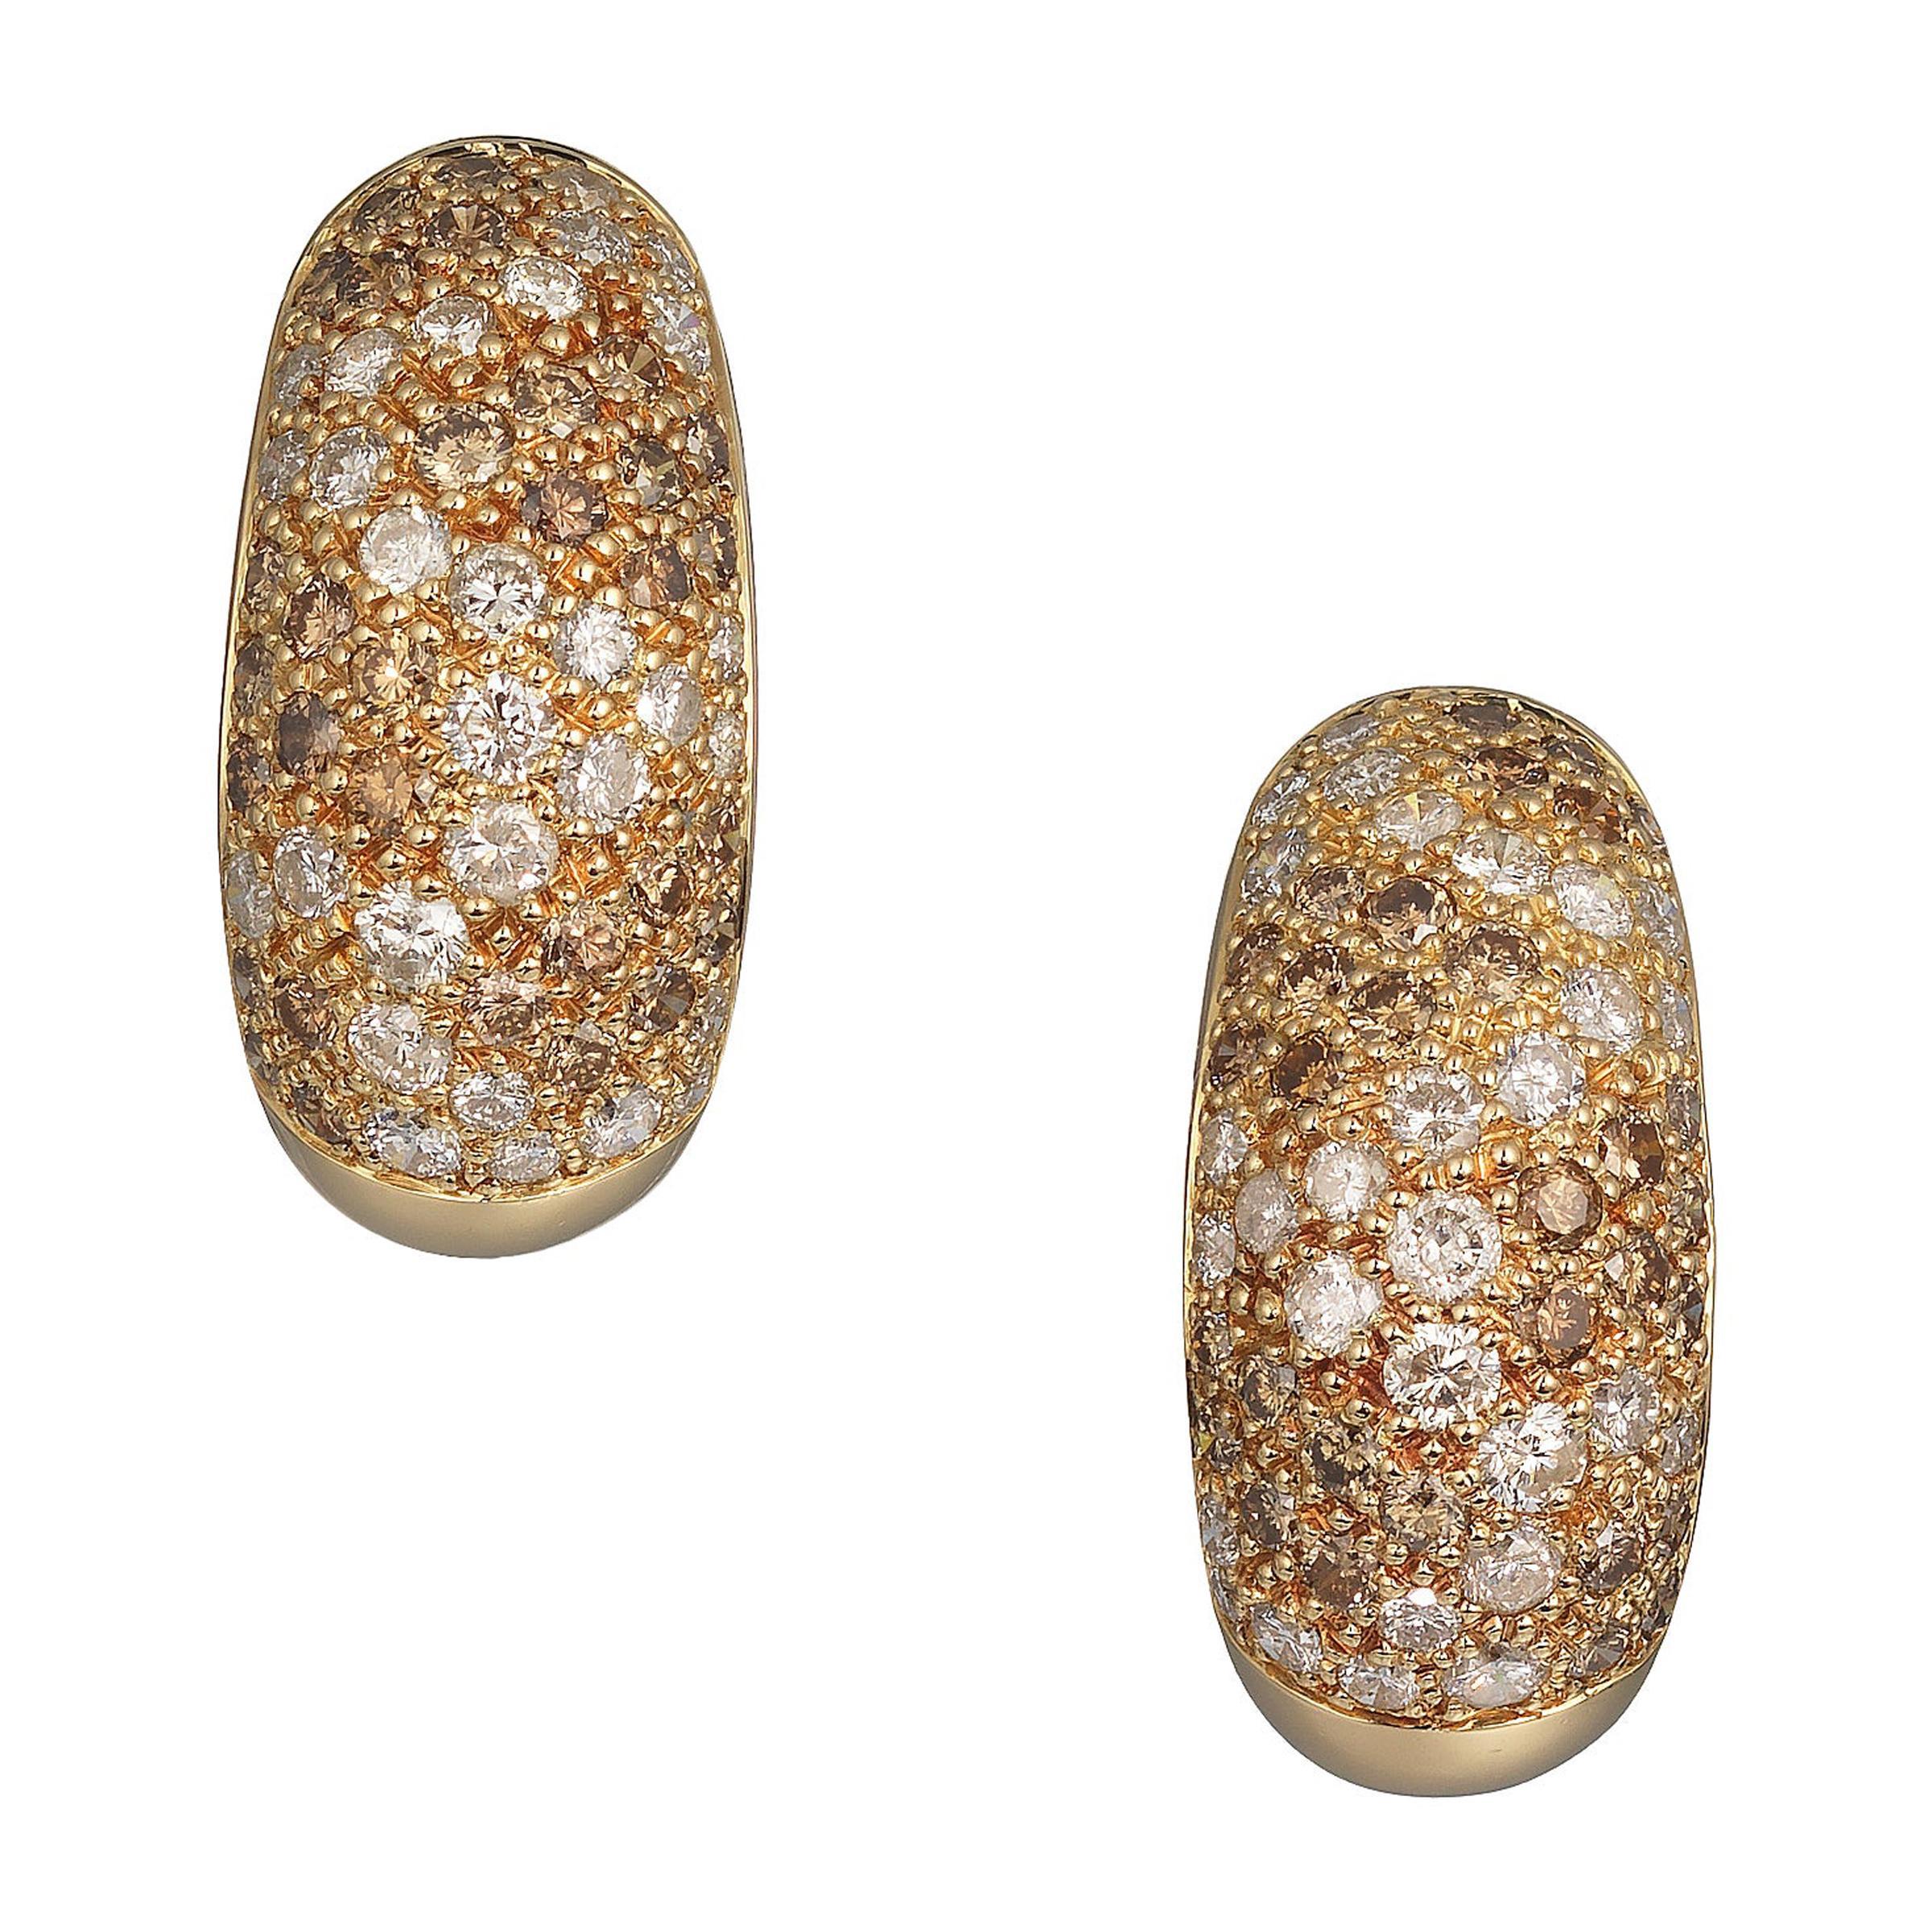 Cartier Vintage Diamond and 18 Karat Gold Bombe Earrings